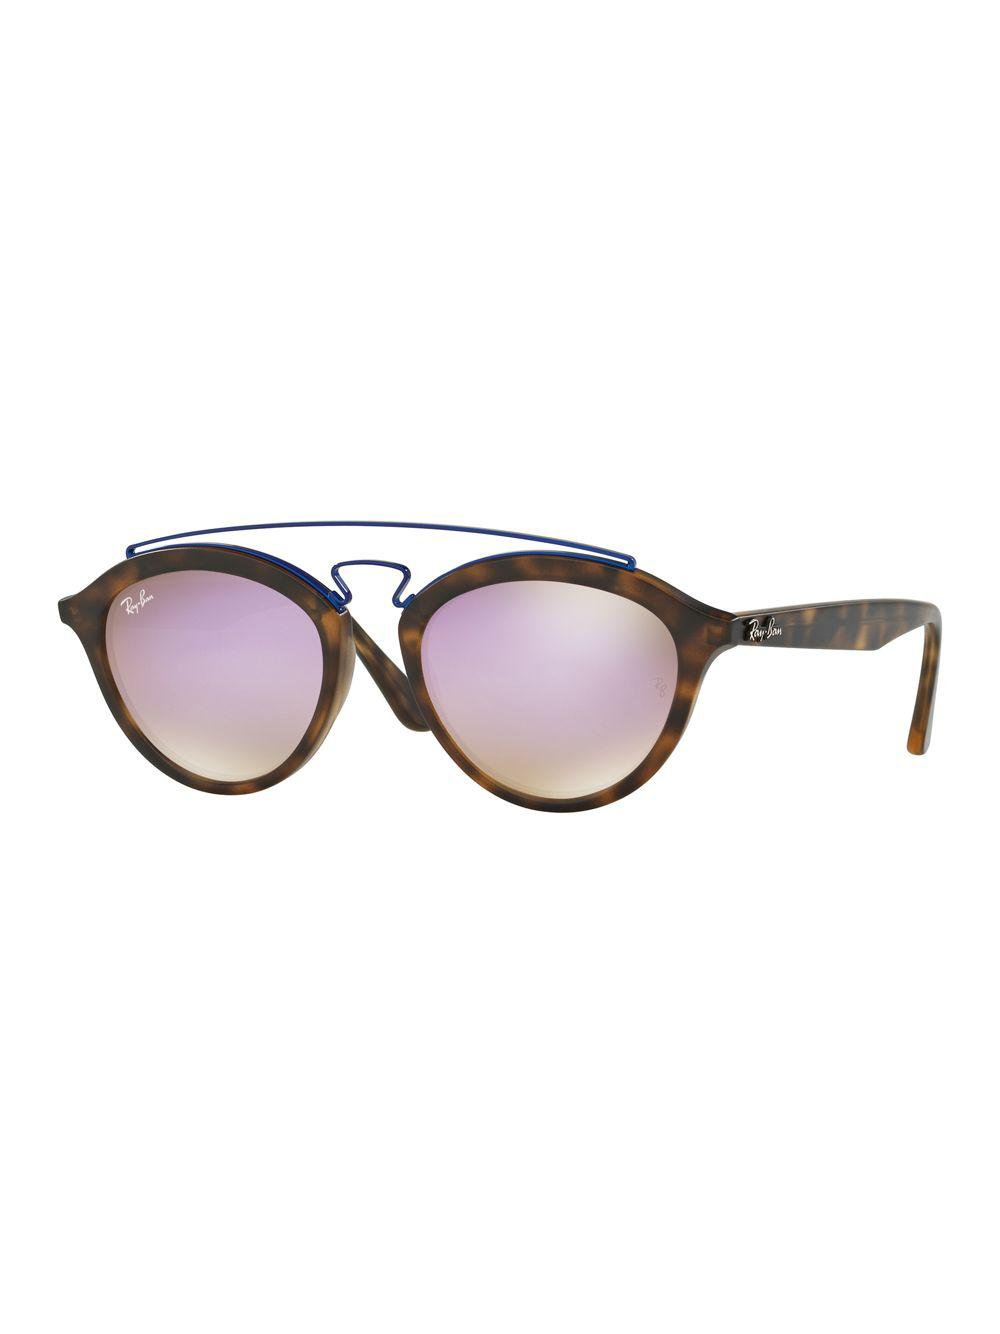 c81e8bc54ad Ray-Ban 19mm Double Bridge Gatsby Sunglasses in Brown - Lyst